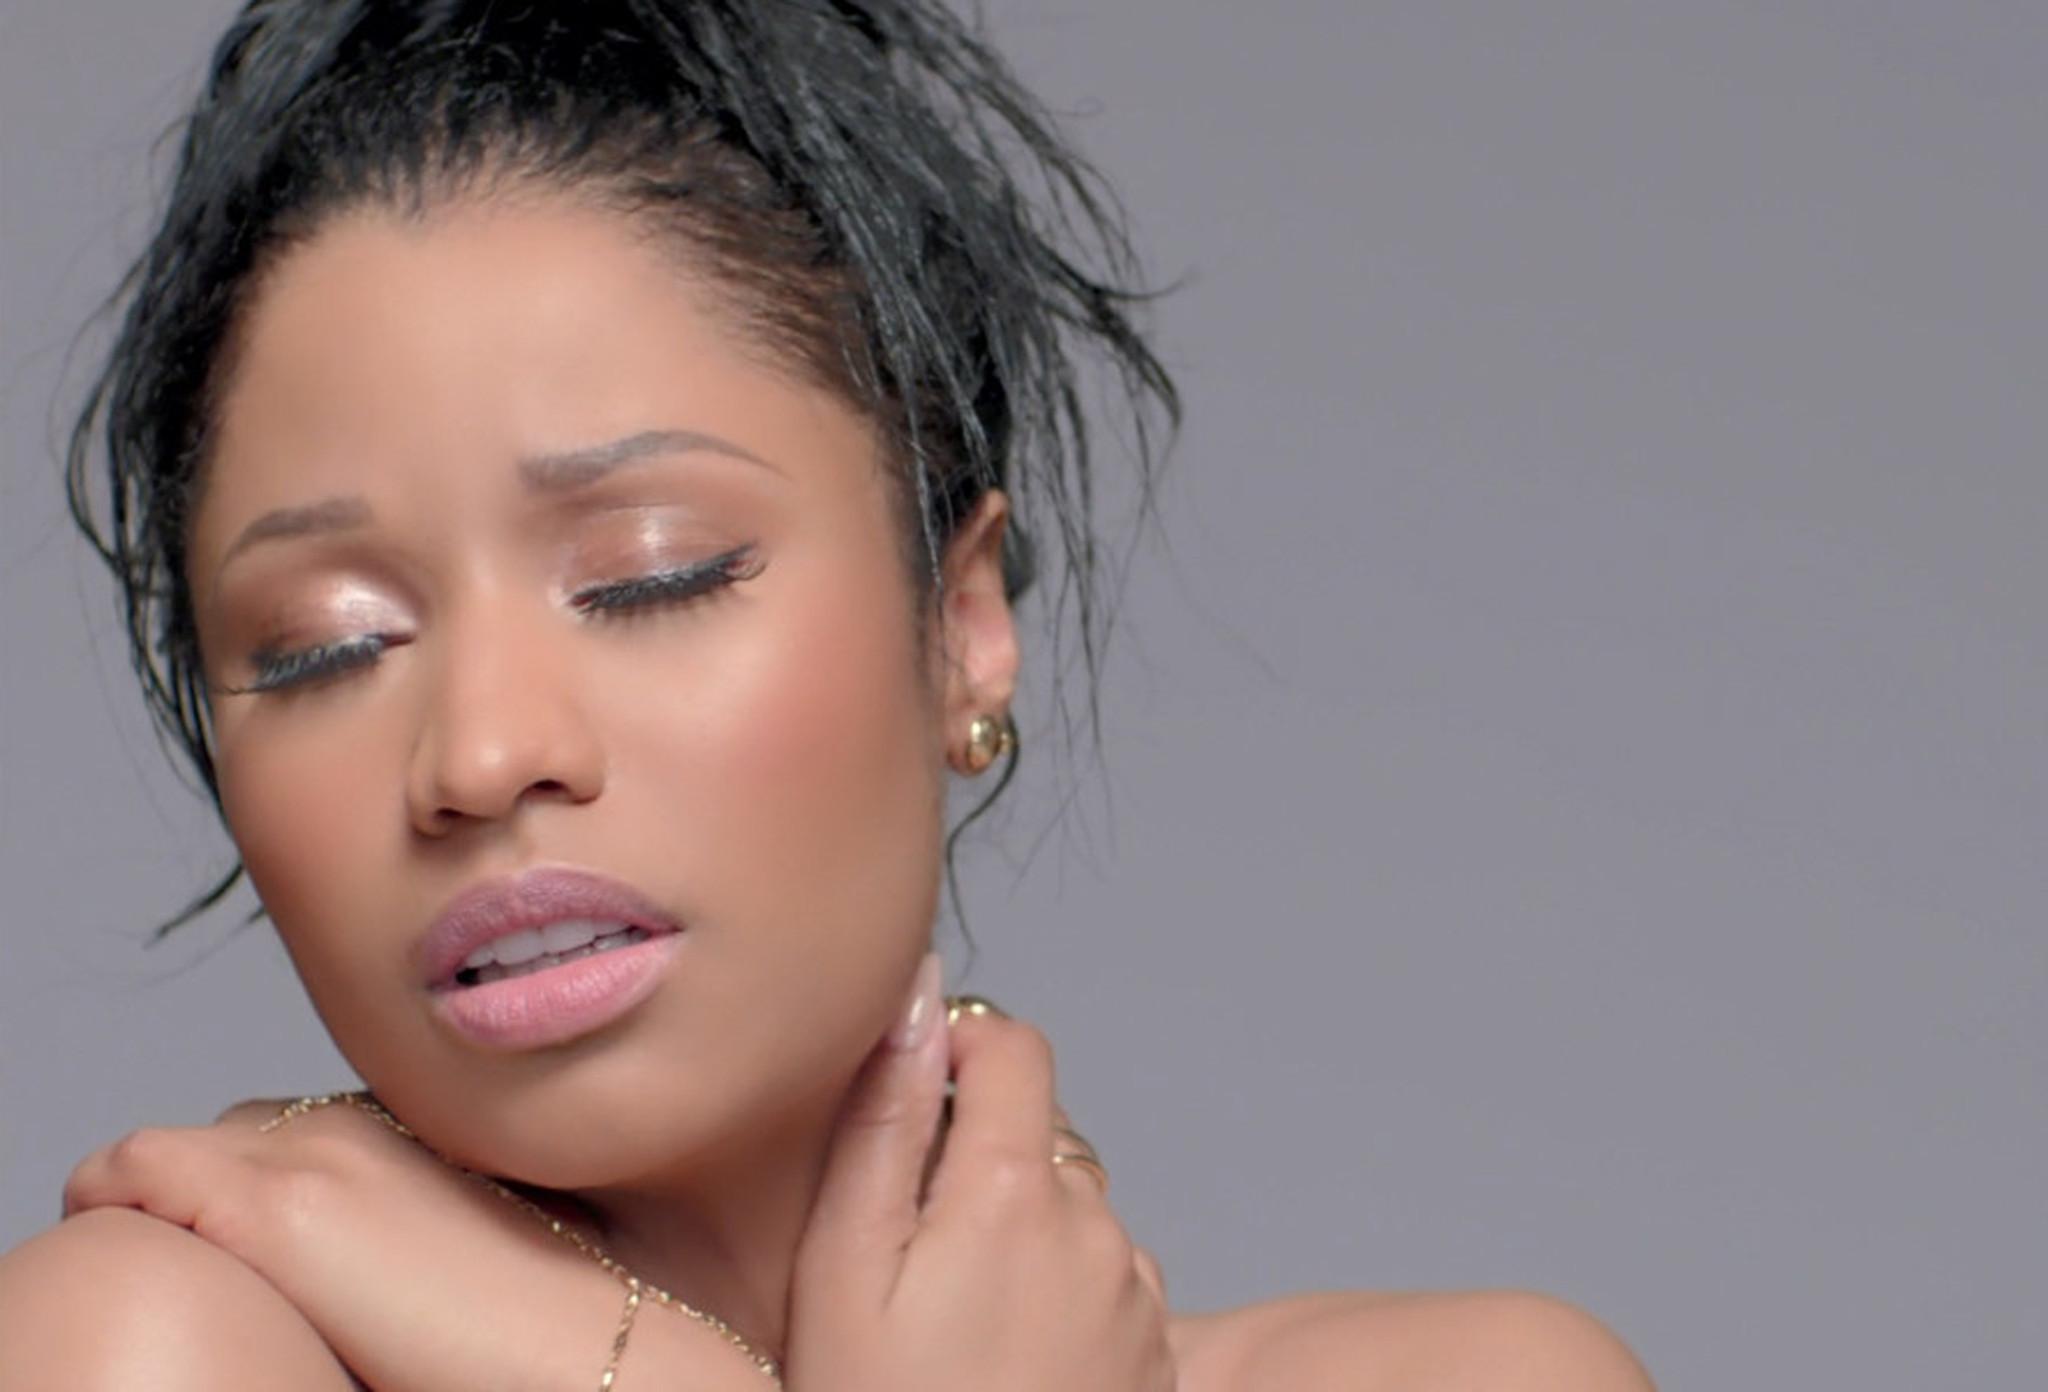 Nicki Videos How To Make Goo